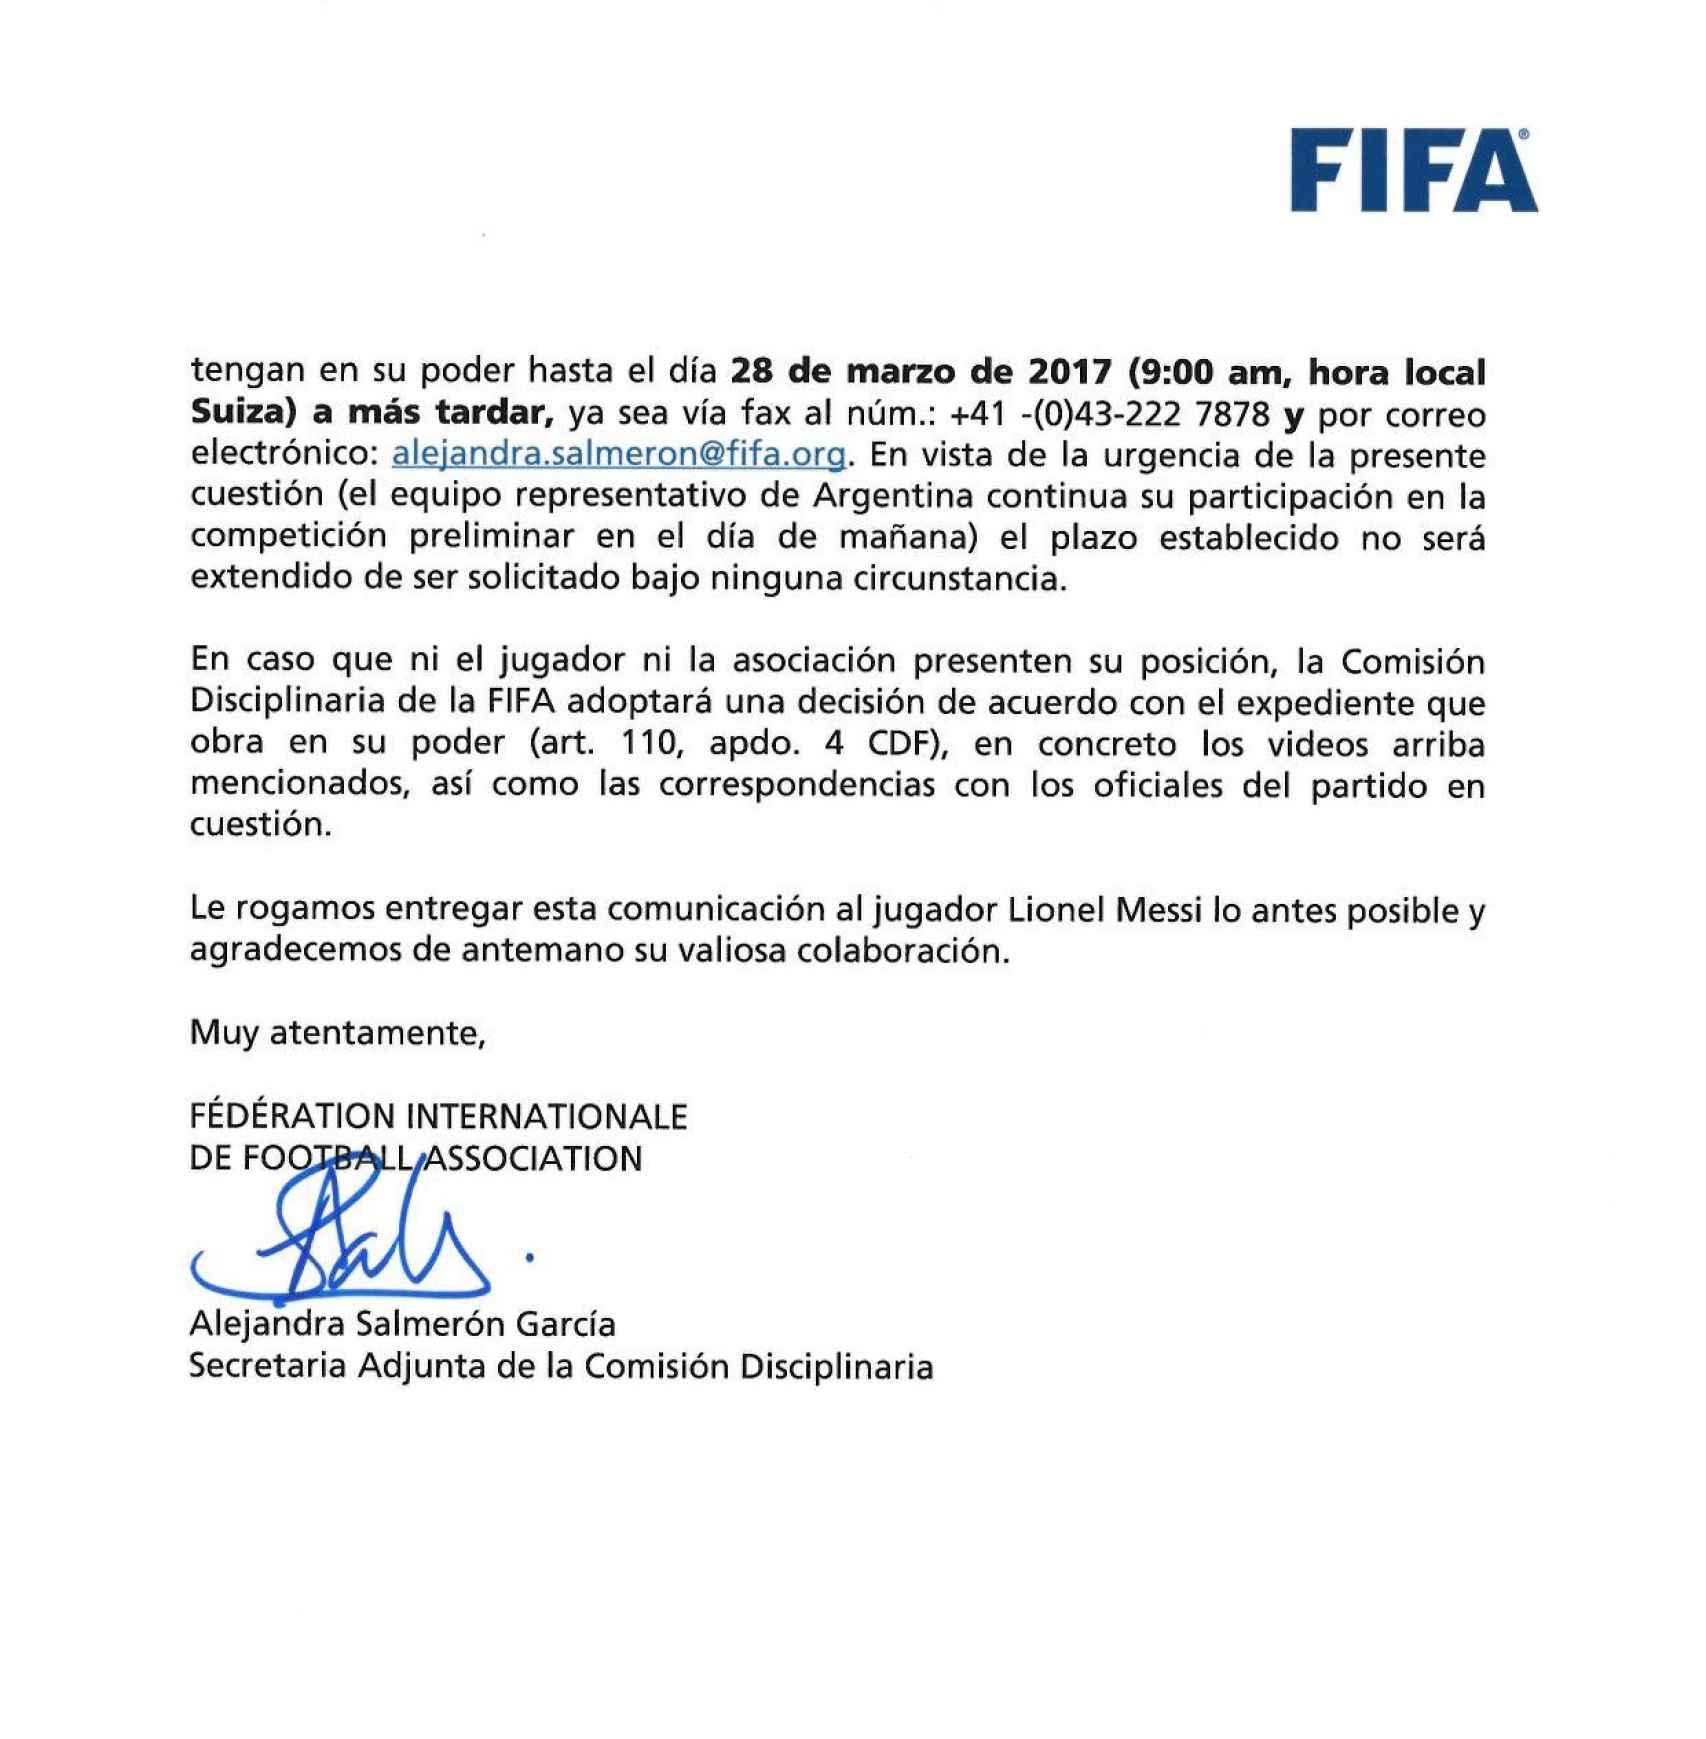 Comunicado de la FIFA a la AFA.